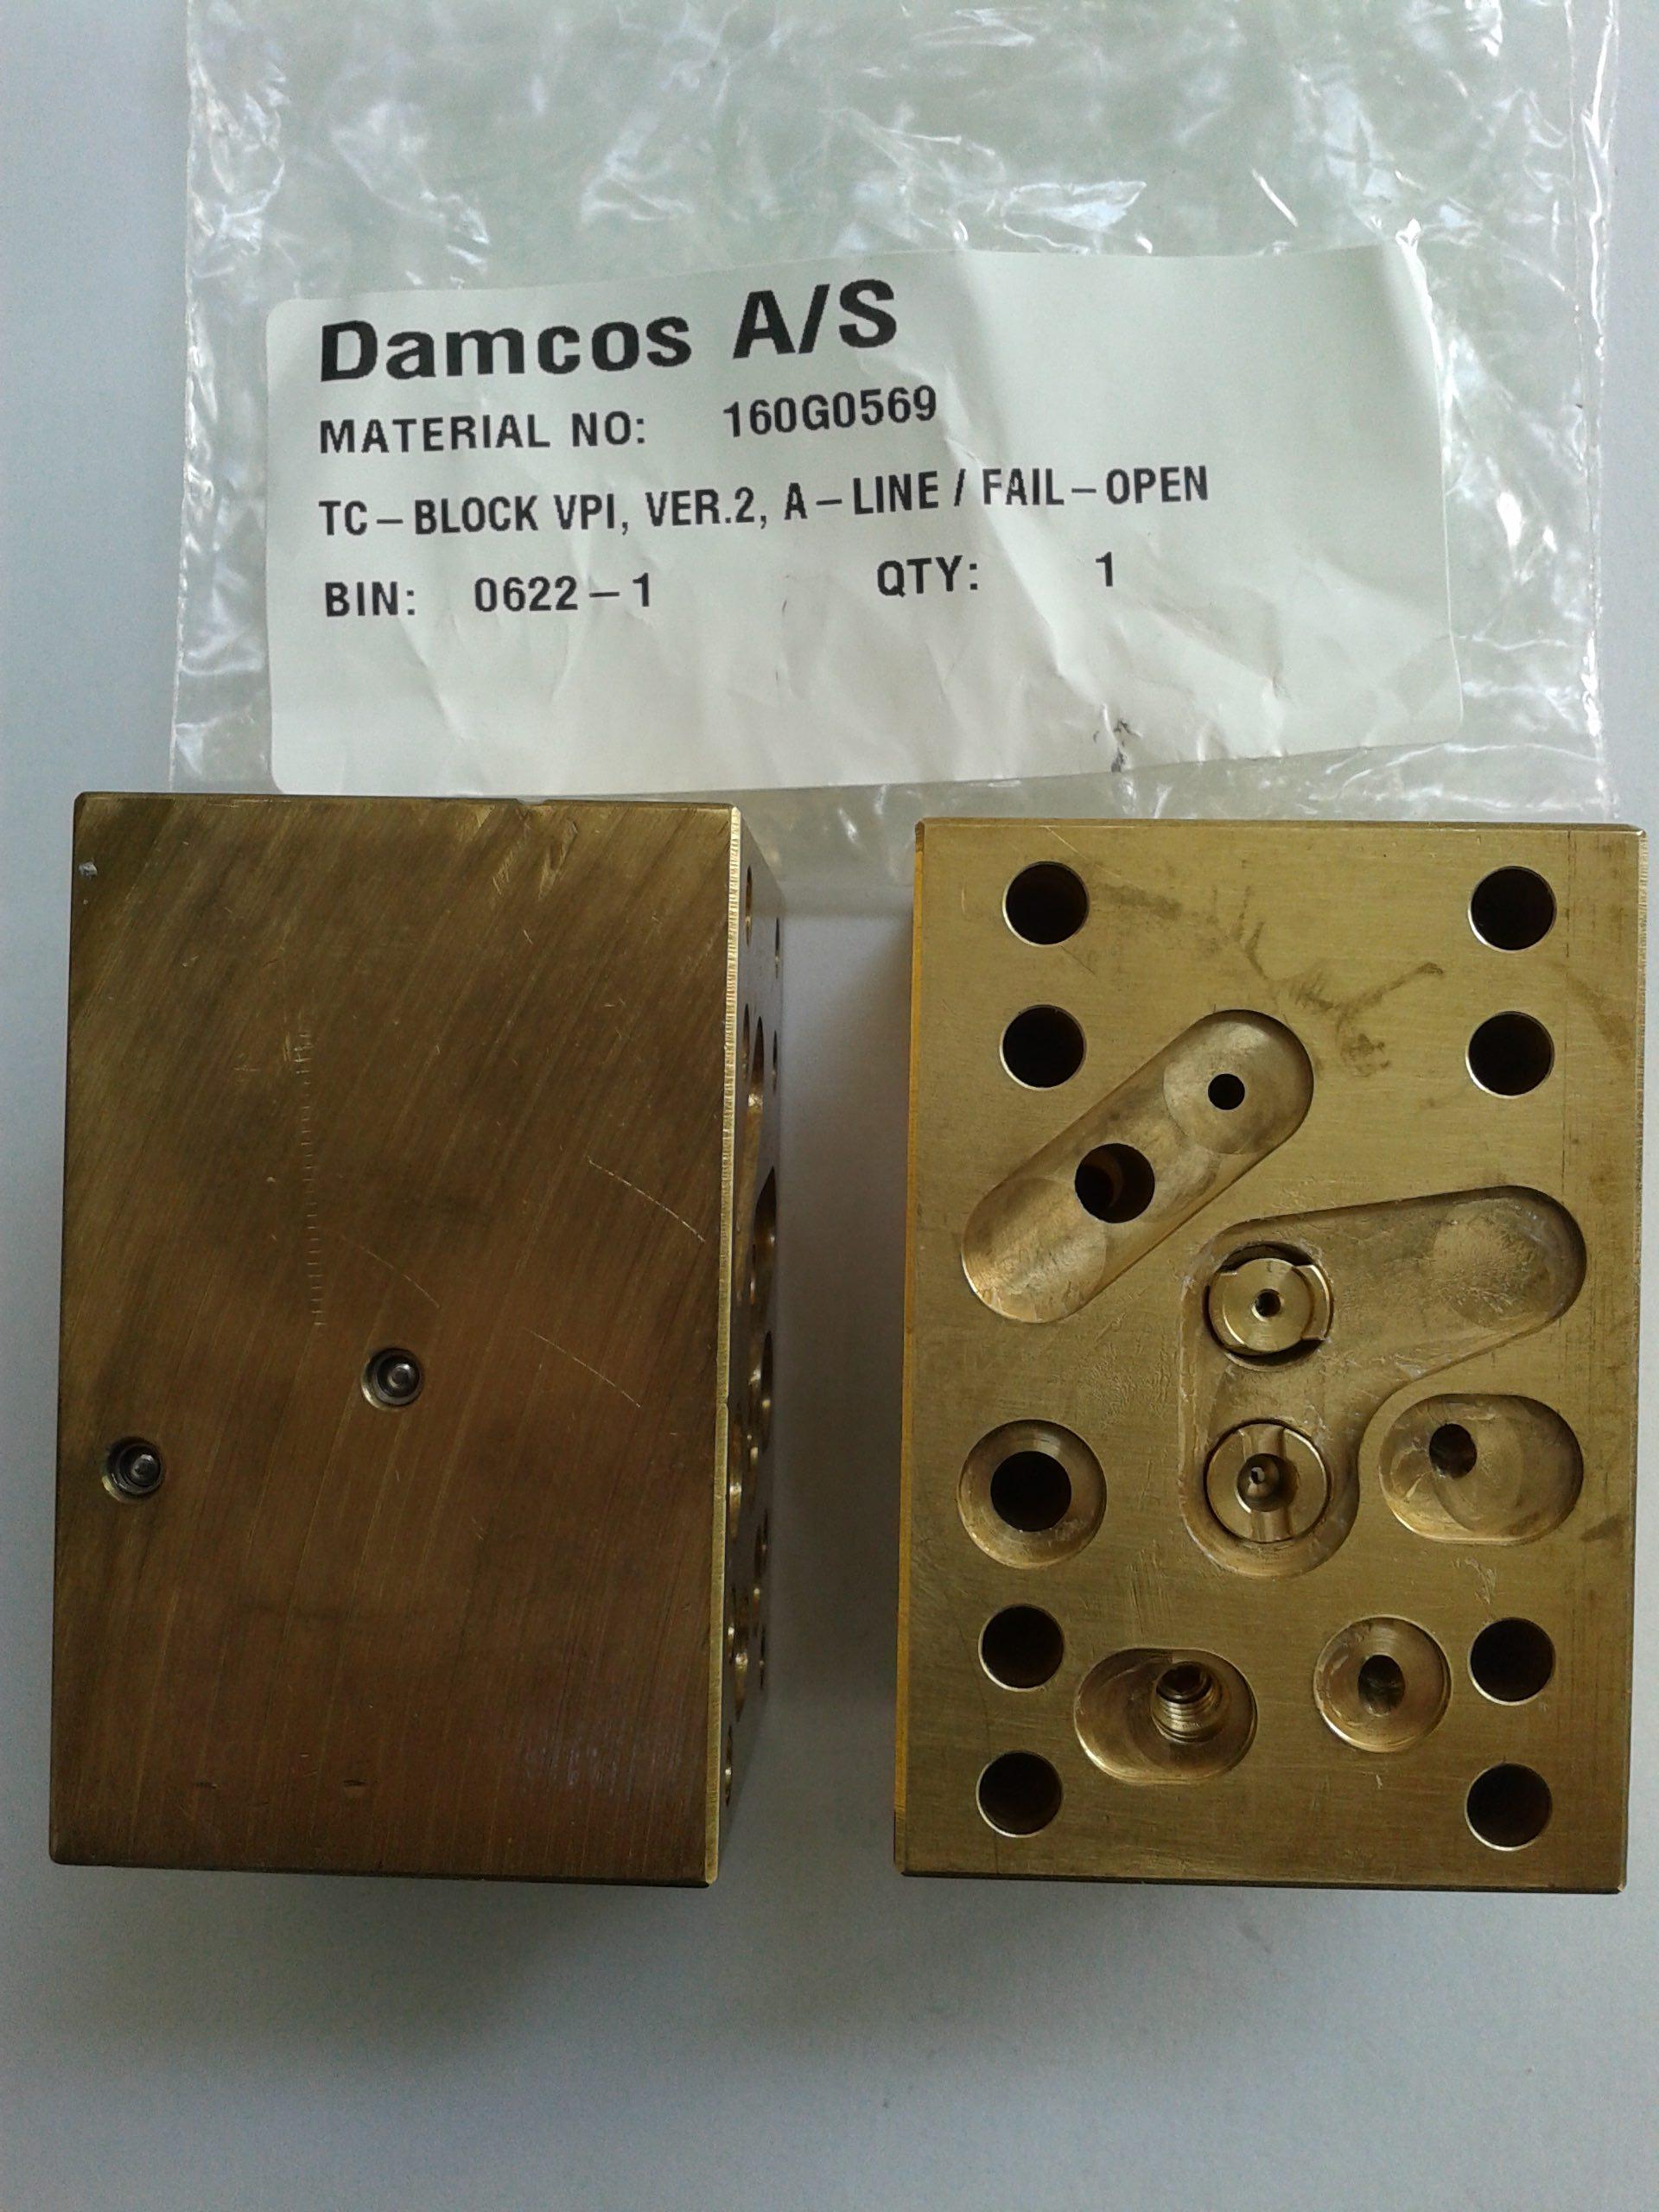 Damcos : Danfoss VPI-TC FO Control Block 160G0569 Fail Open